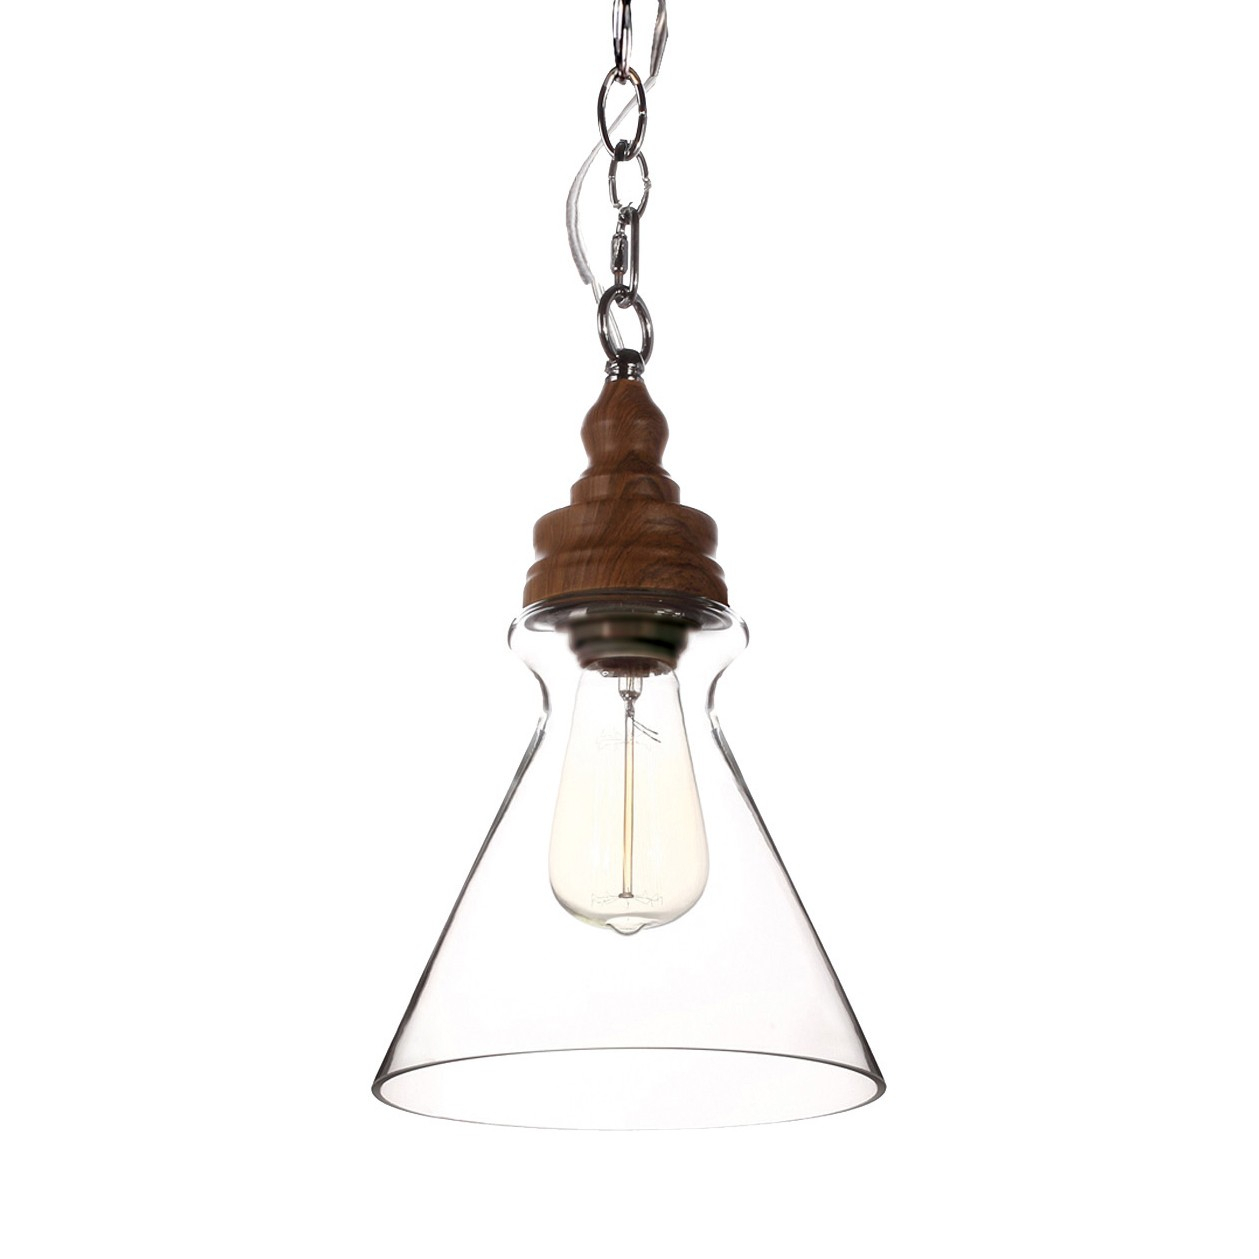 Britop Edvin Cone Ceiling Pendant Light Throughout Guro 1 Light Cone Pendants (View 14 of 30)